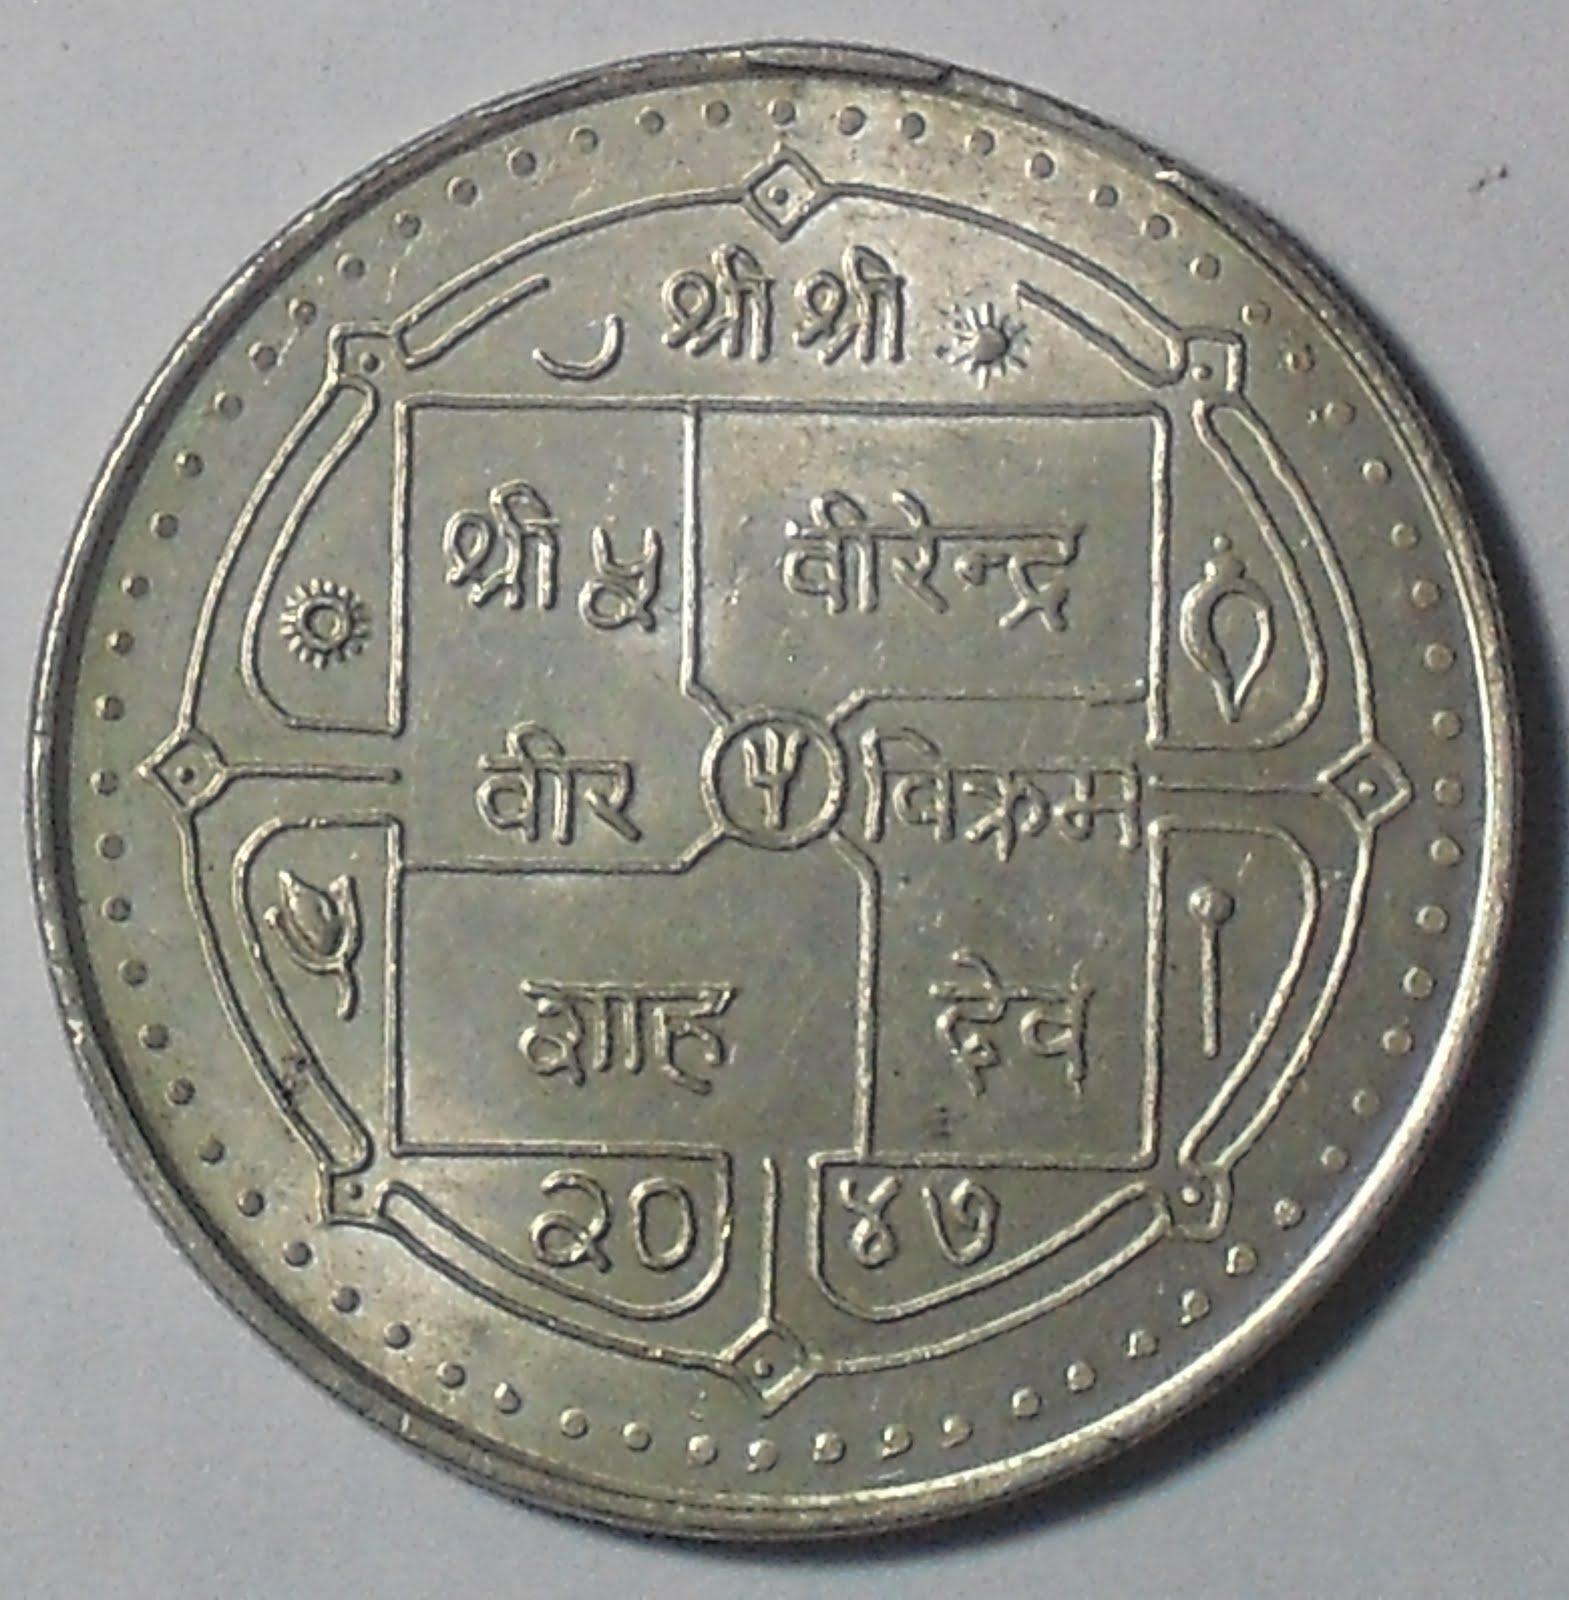 Rupee cryptocurrency price